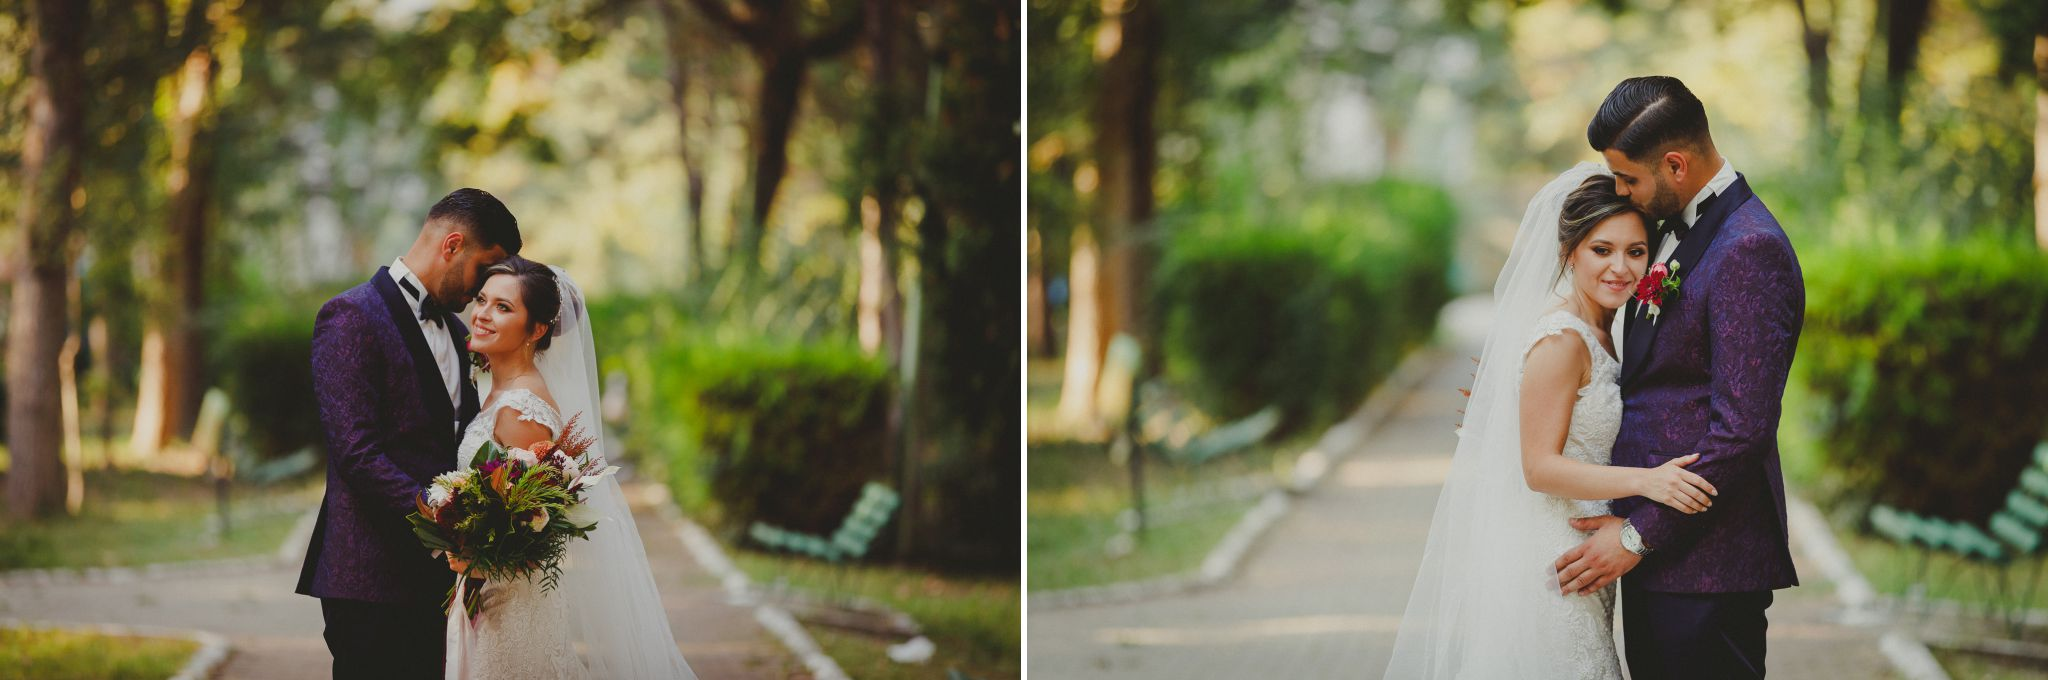 undphotography, undmedia, fotograf, fotograf constanta, fotograf profesionist constanta, fotograf nunta, fotograf nunta constanta, fotograf botez, fotograf botez constanta, fotograf familie, fotograf familie constanta, fotograf newborn, fotograf newborn constanta, fotograf maternitate, fotograf maternitate constanta, fotograf studio, fotograf studio constanta, studio foto, studio foto constanta, sedinte foto, sedinte foto constanta, trash the dress, trash the dress constanta, fotograf logodna, fotograf logodna constanta, album foto, album foto constanta, fotograf corporate, fotograf corporate constanta, fotografie eveniment, fotografie eveniment constant, fotograf bucuresti, fotograf nunta bucuresti, fotograf brasov, fotograf nunta brasov, fotograf cluj, fotograf nunta cluj